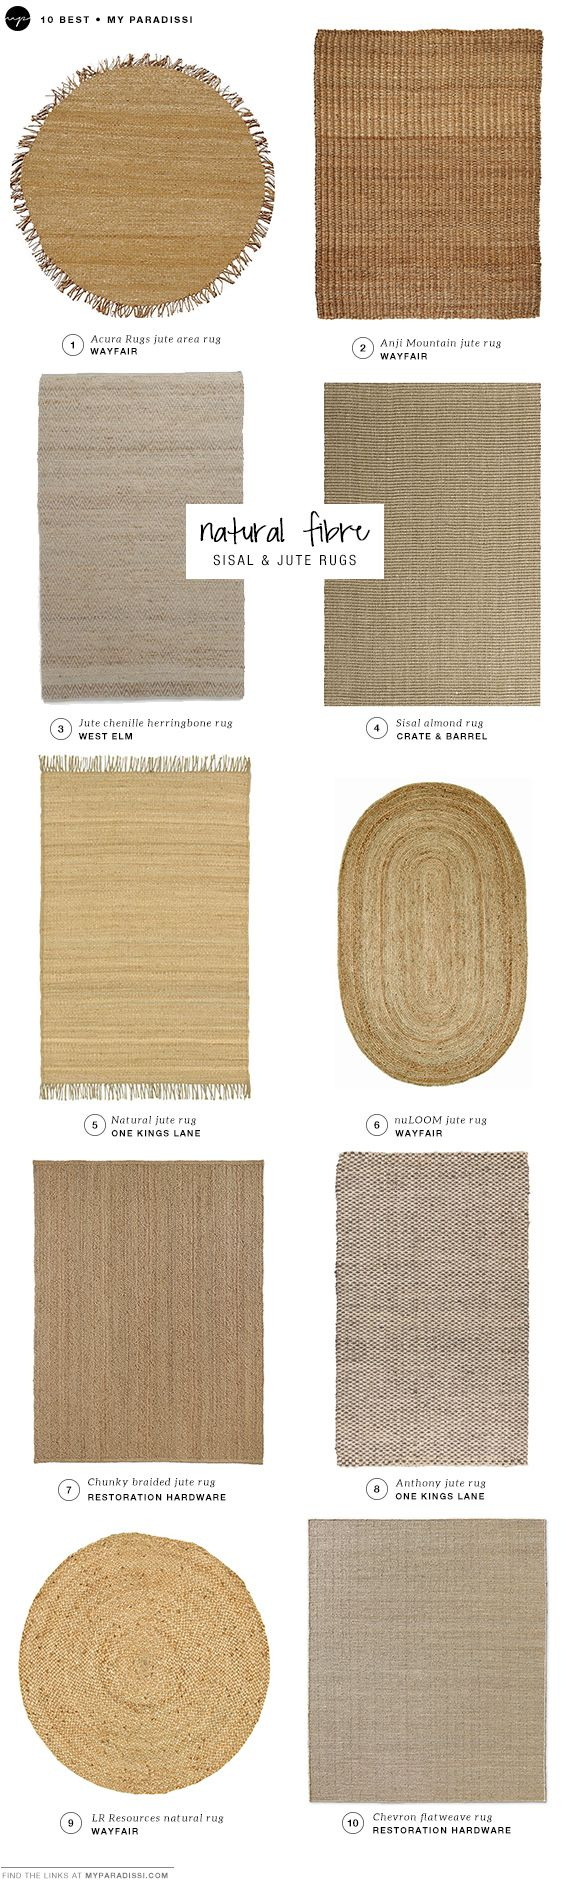 DECOR TREND Sisal and jute rugs  1 INTERIORES  Alfombra